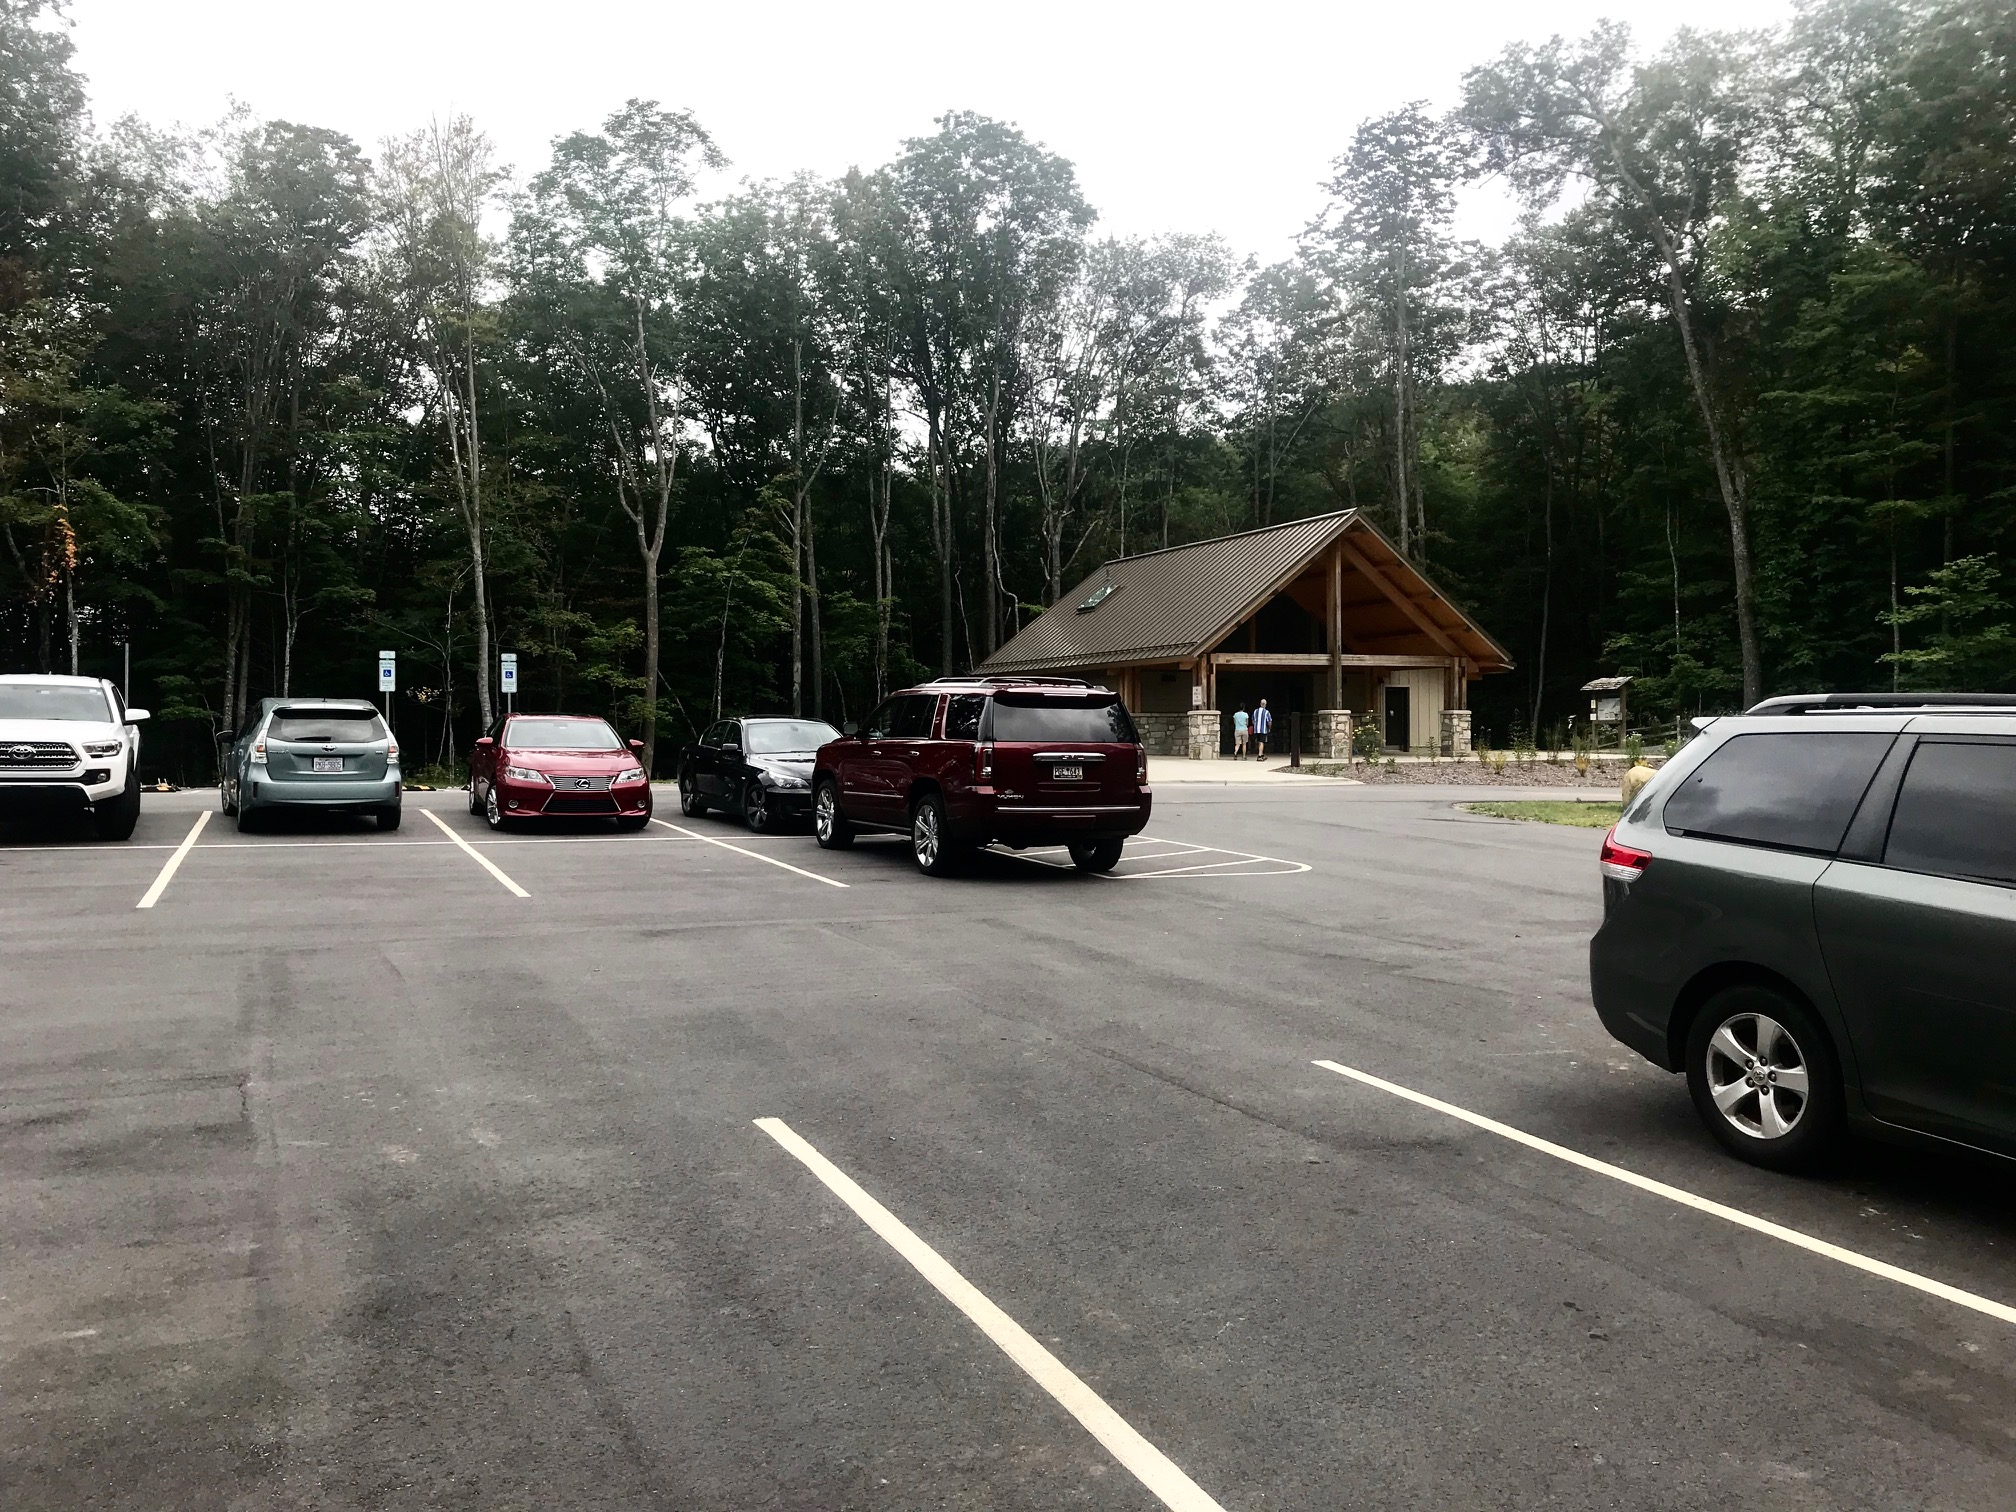 Profile Trail, Grandfather Mountain, Banner Elk, Foscoe, hike, Life in Boone